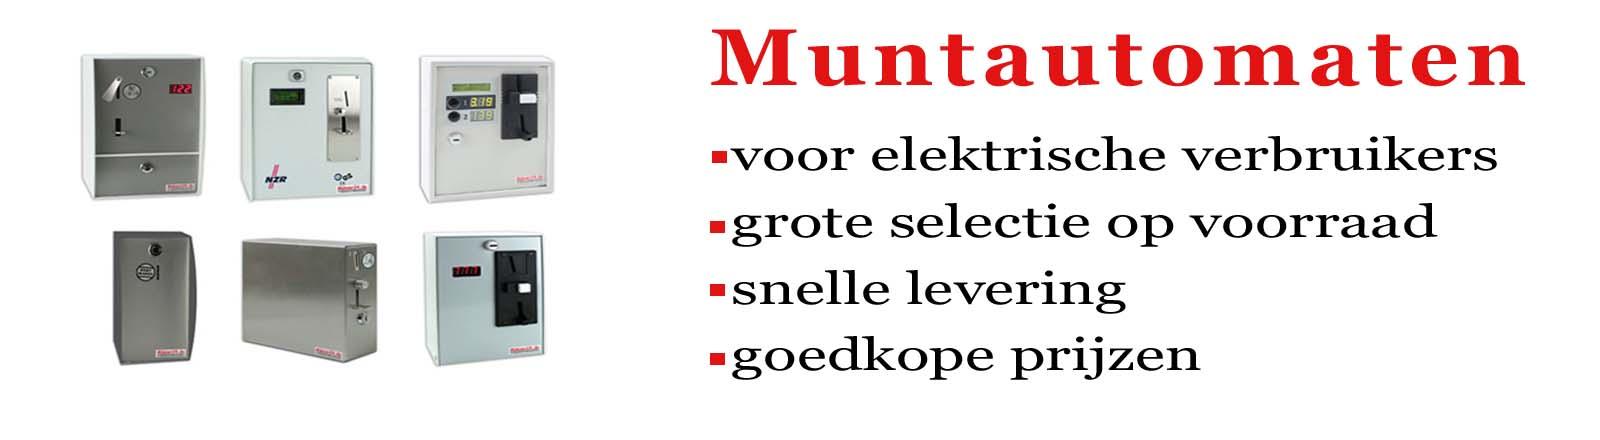 Banner Muntautomat